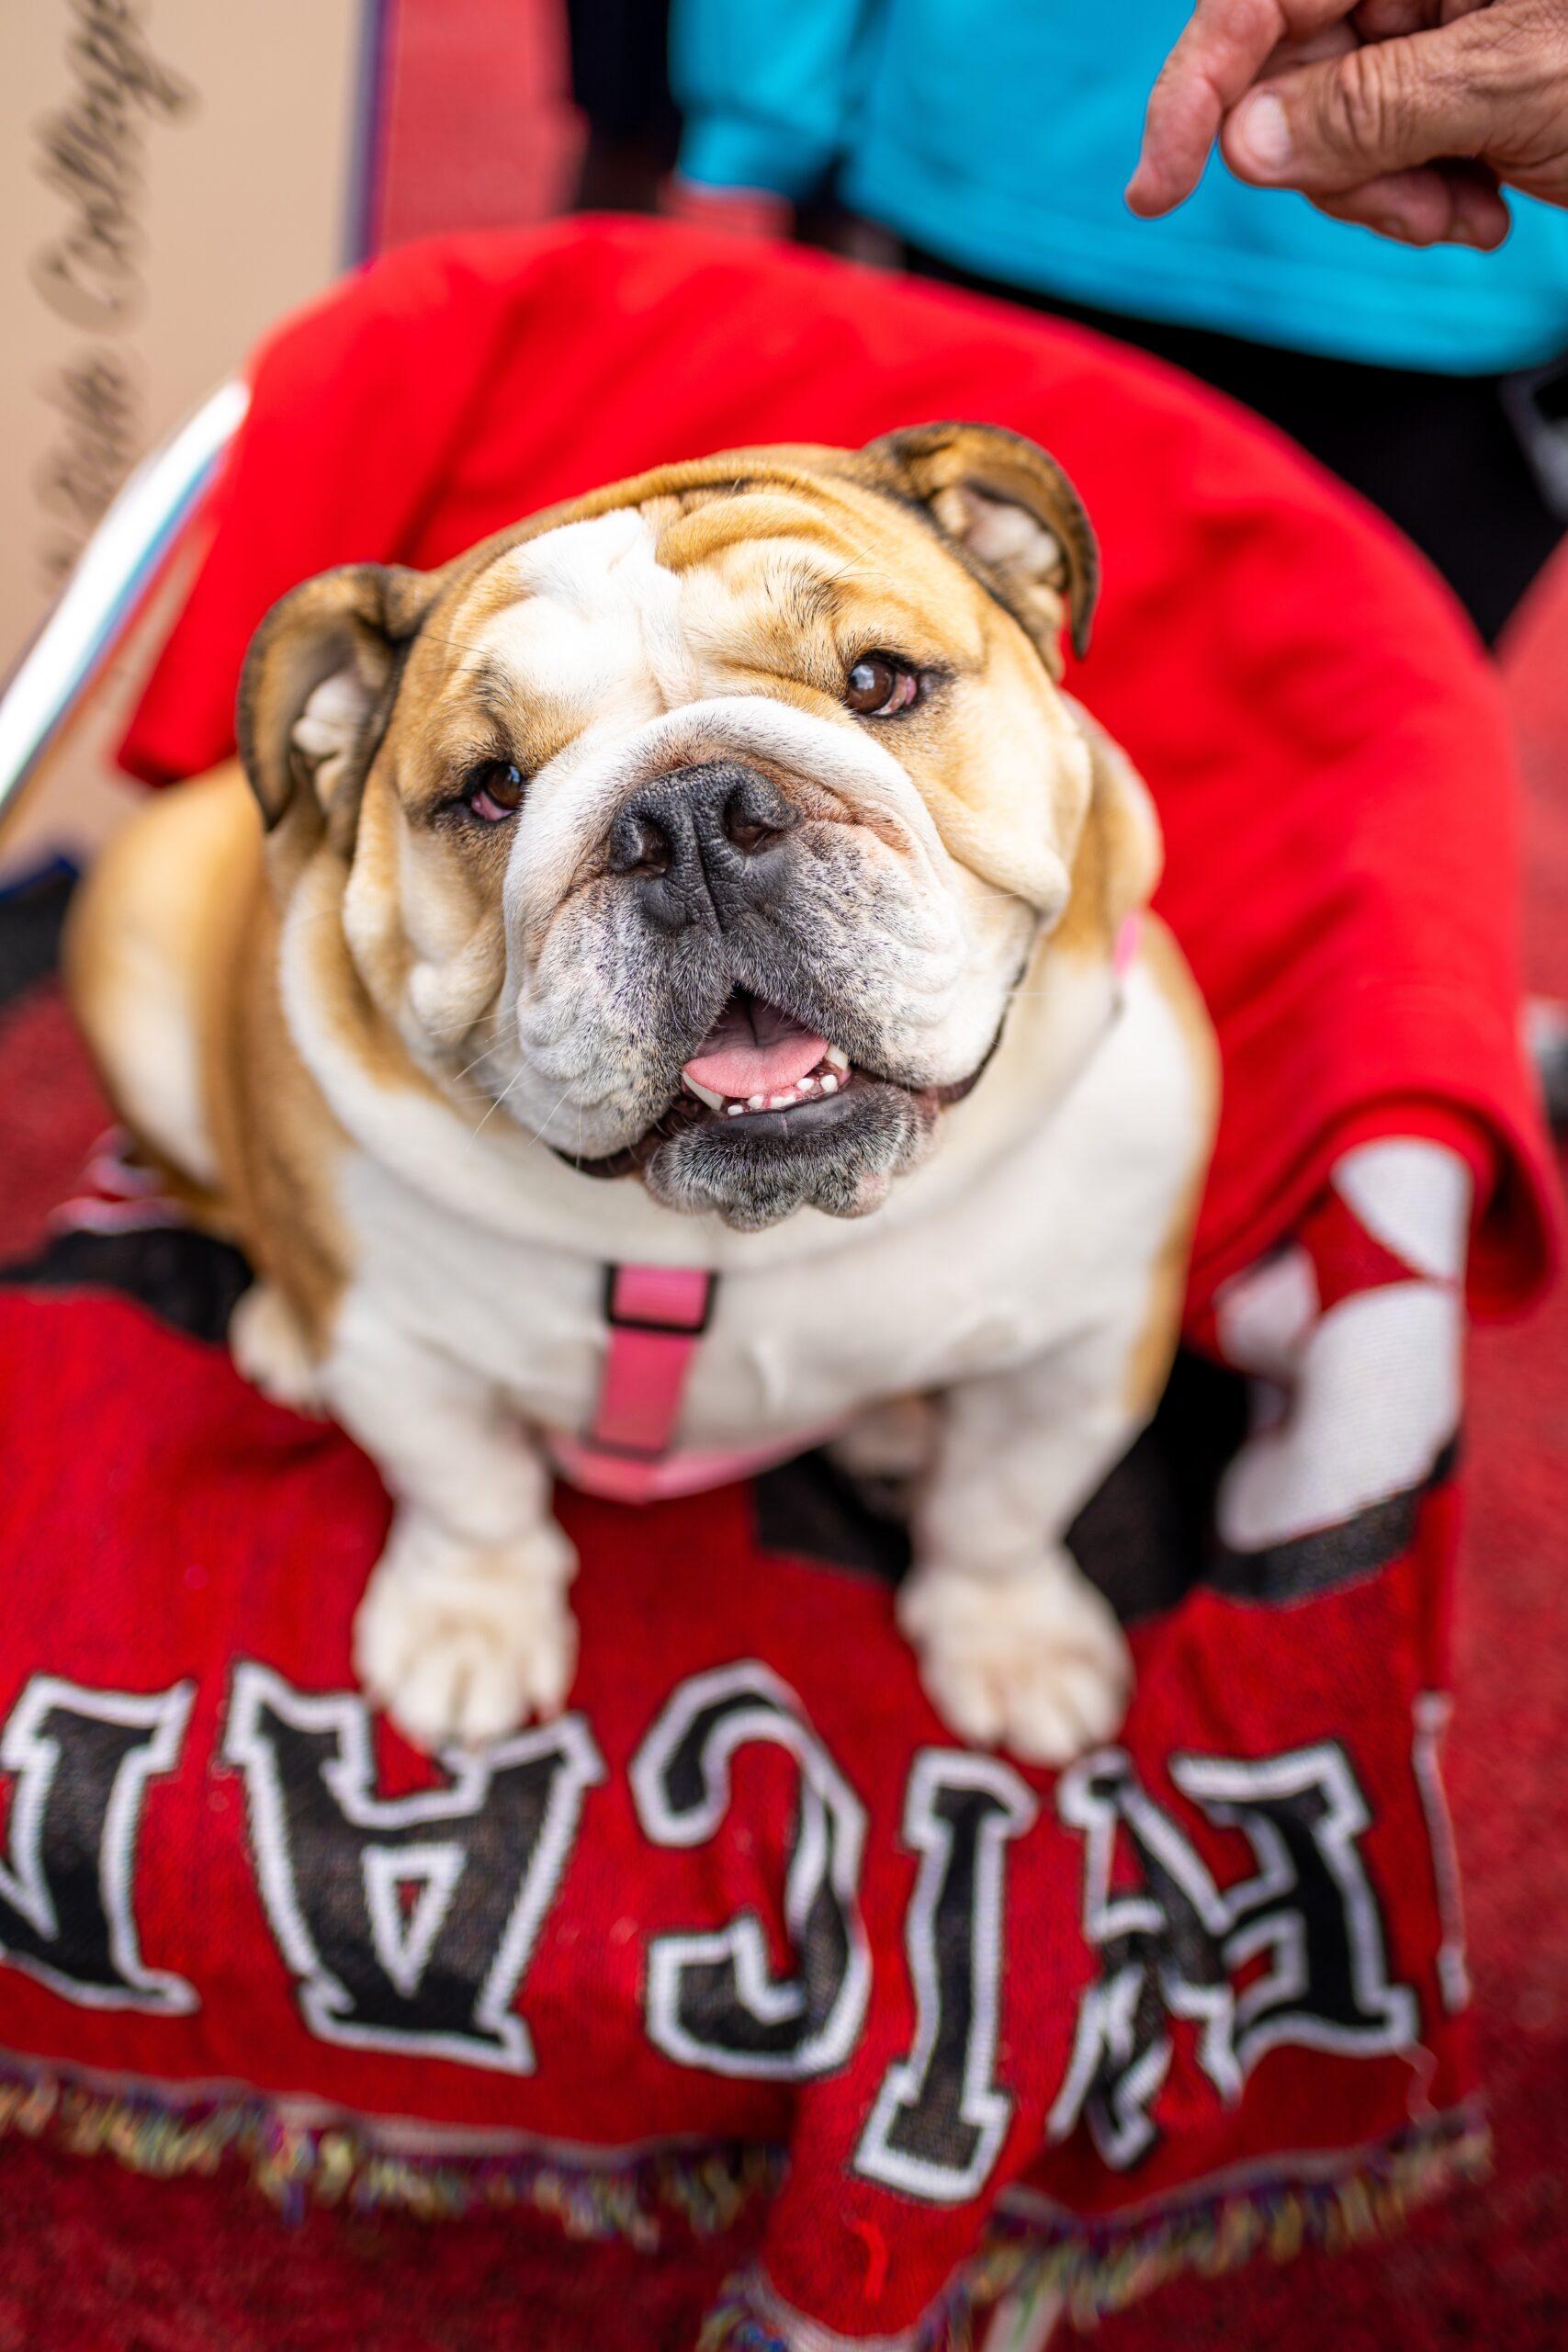 babydog on red blanket